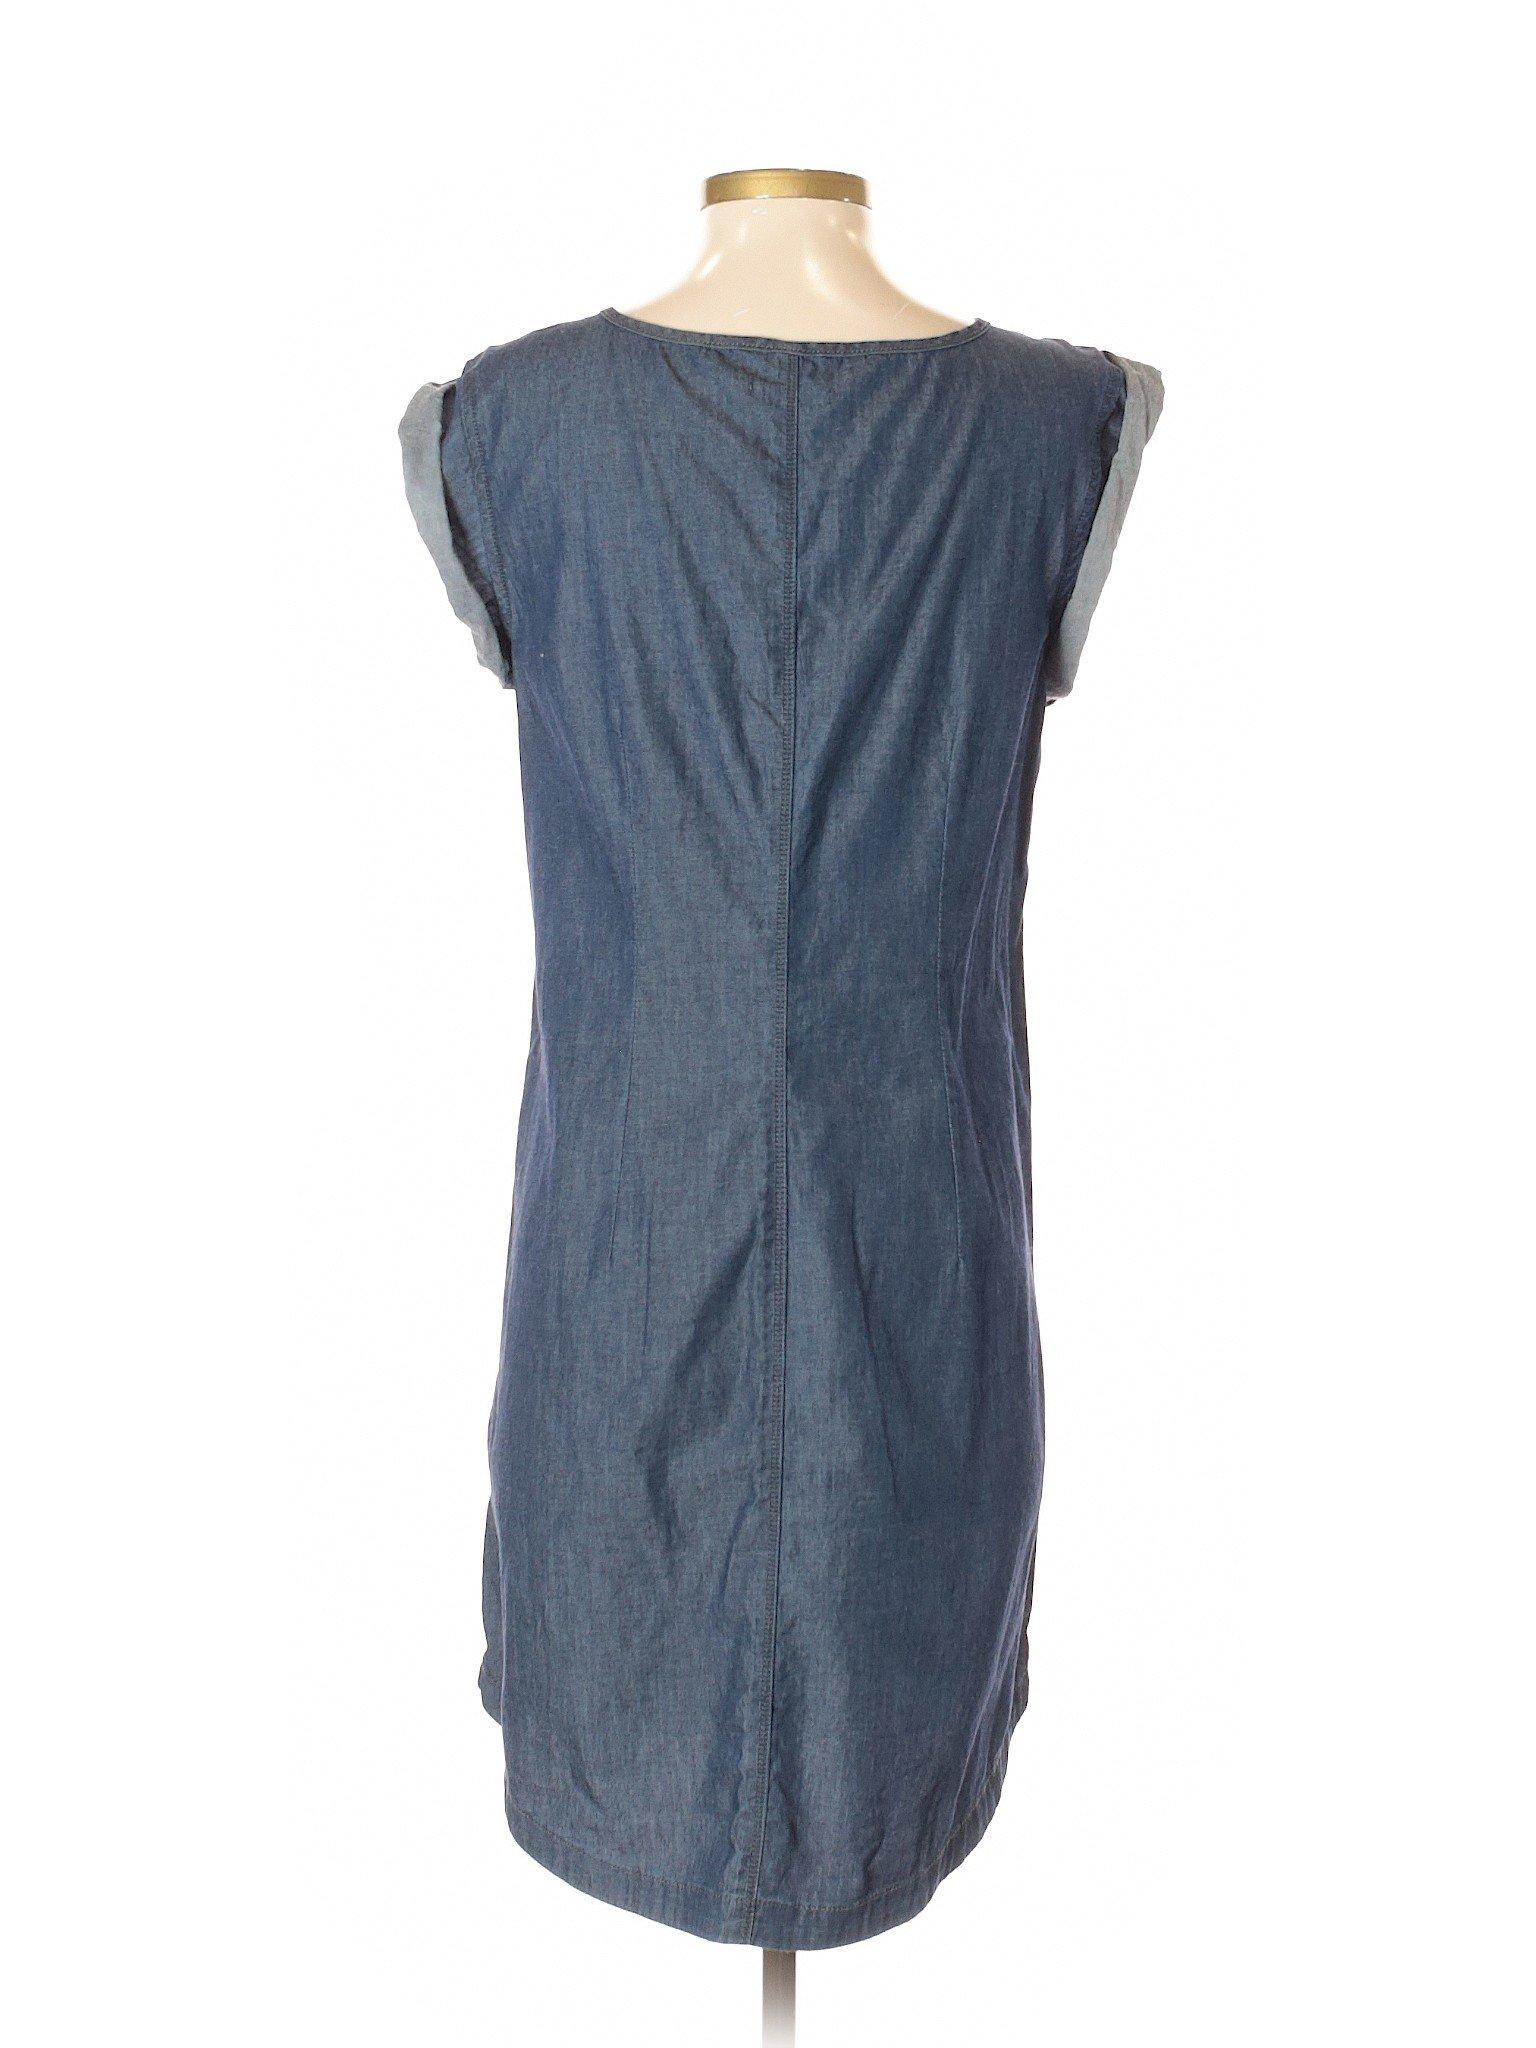 Boutique Casual winter Boutique Gap Dress winter Dress Casual Gap x5qwtw4fI